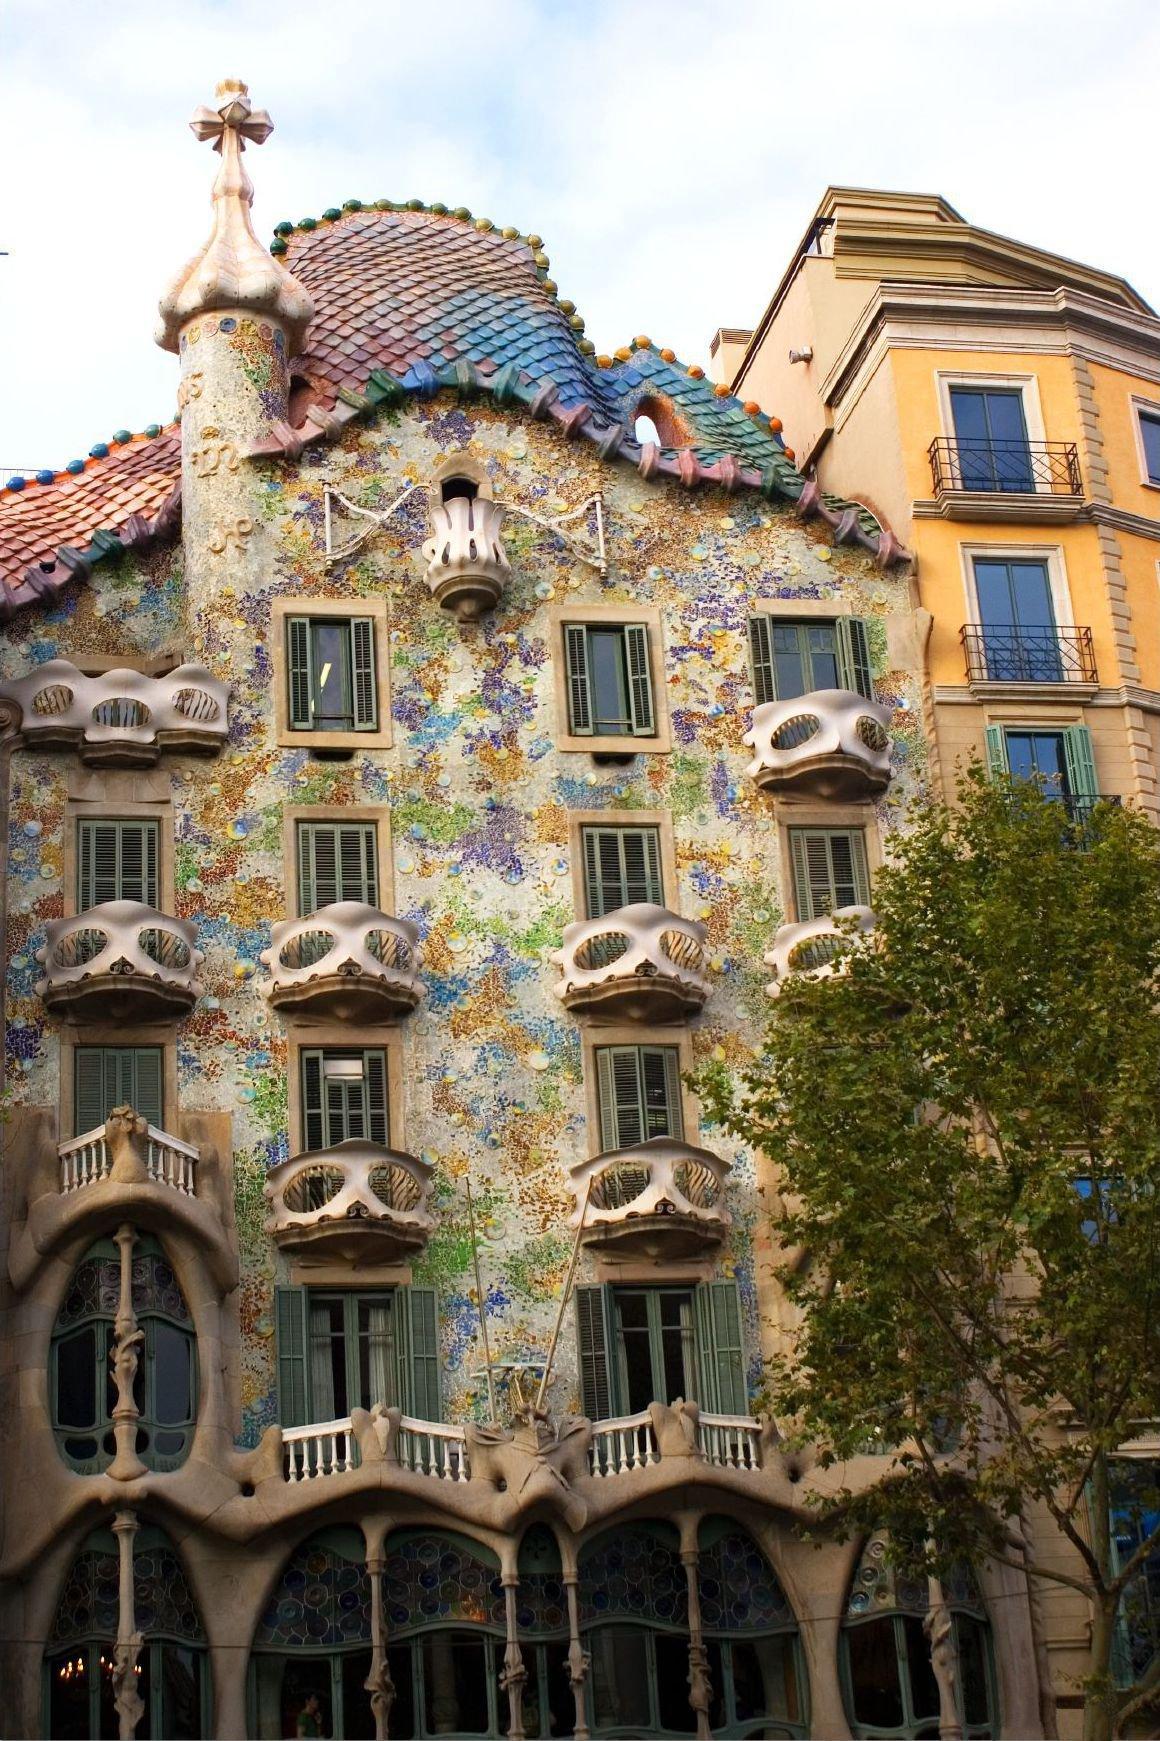 File:Casa Batlló (Barcelona) - 4.jpg - Wikimedia Commons